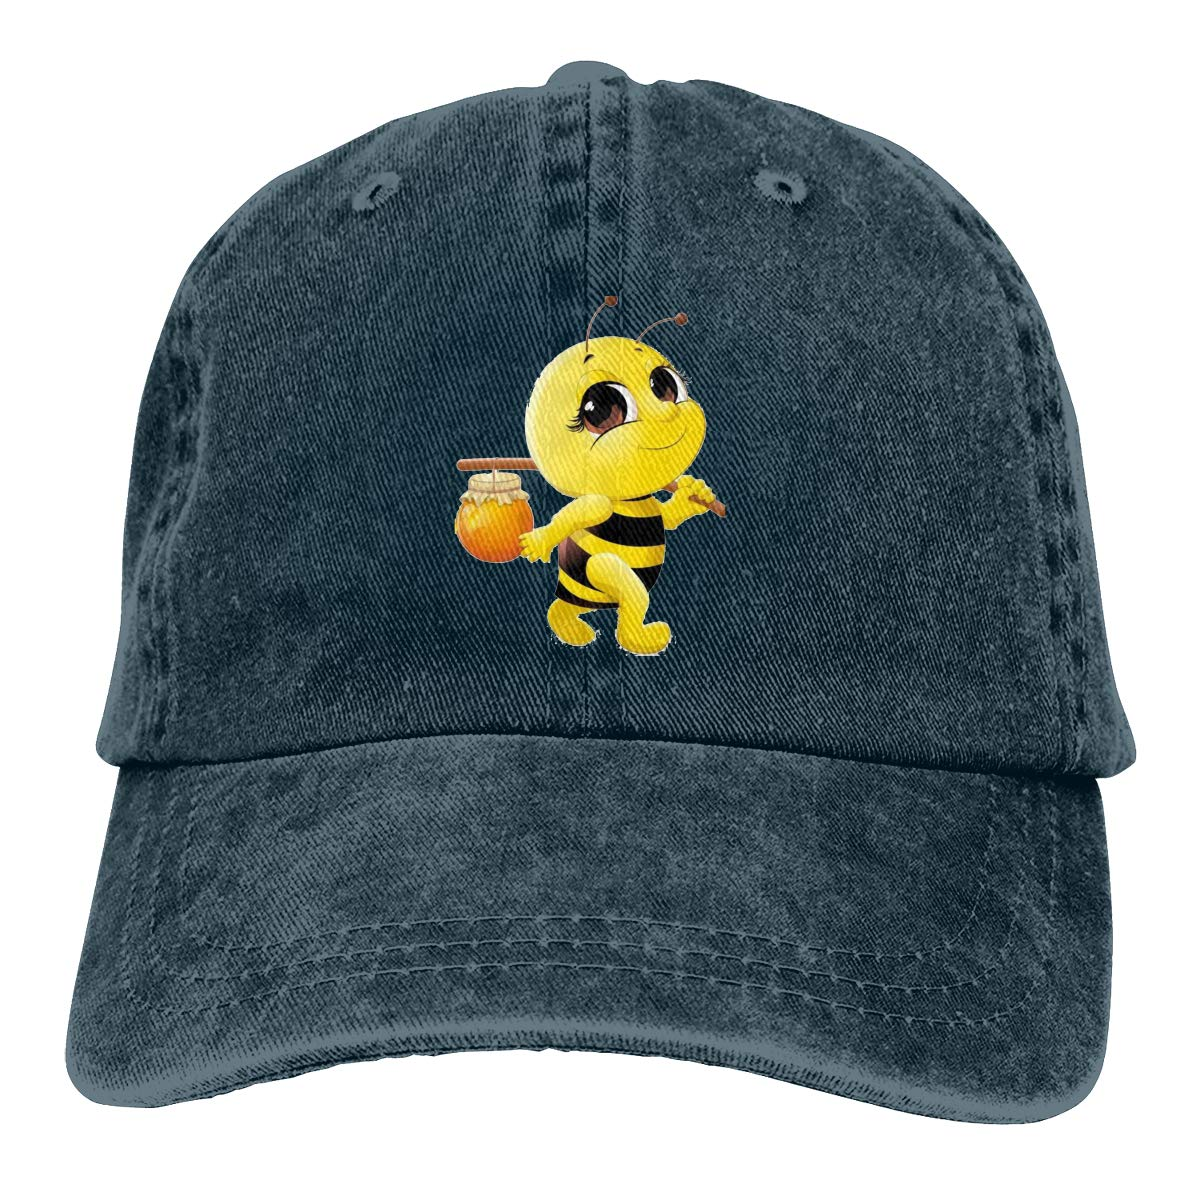 Qbeir Adult Unisex Jeans Cap Adjustable Hat Honey Bee Cotton Denim